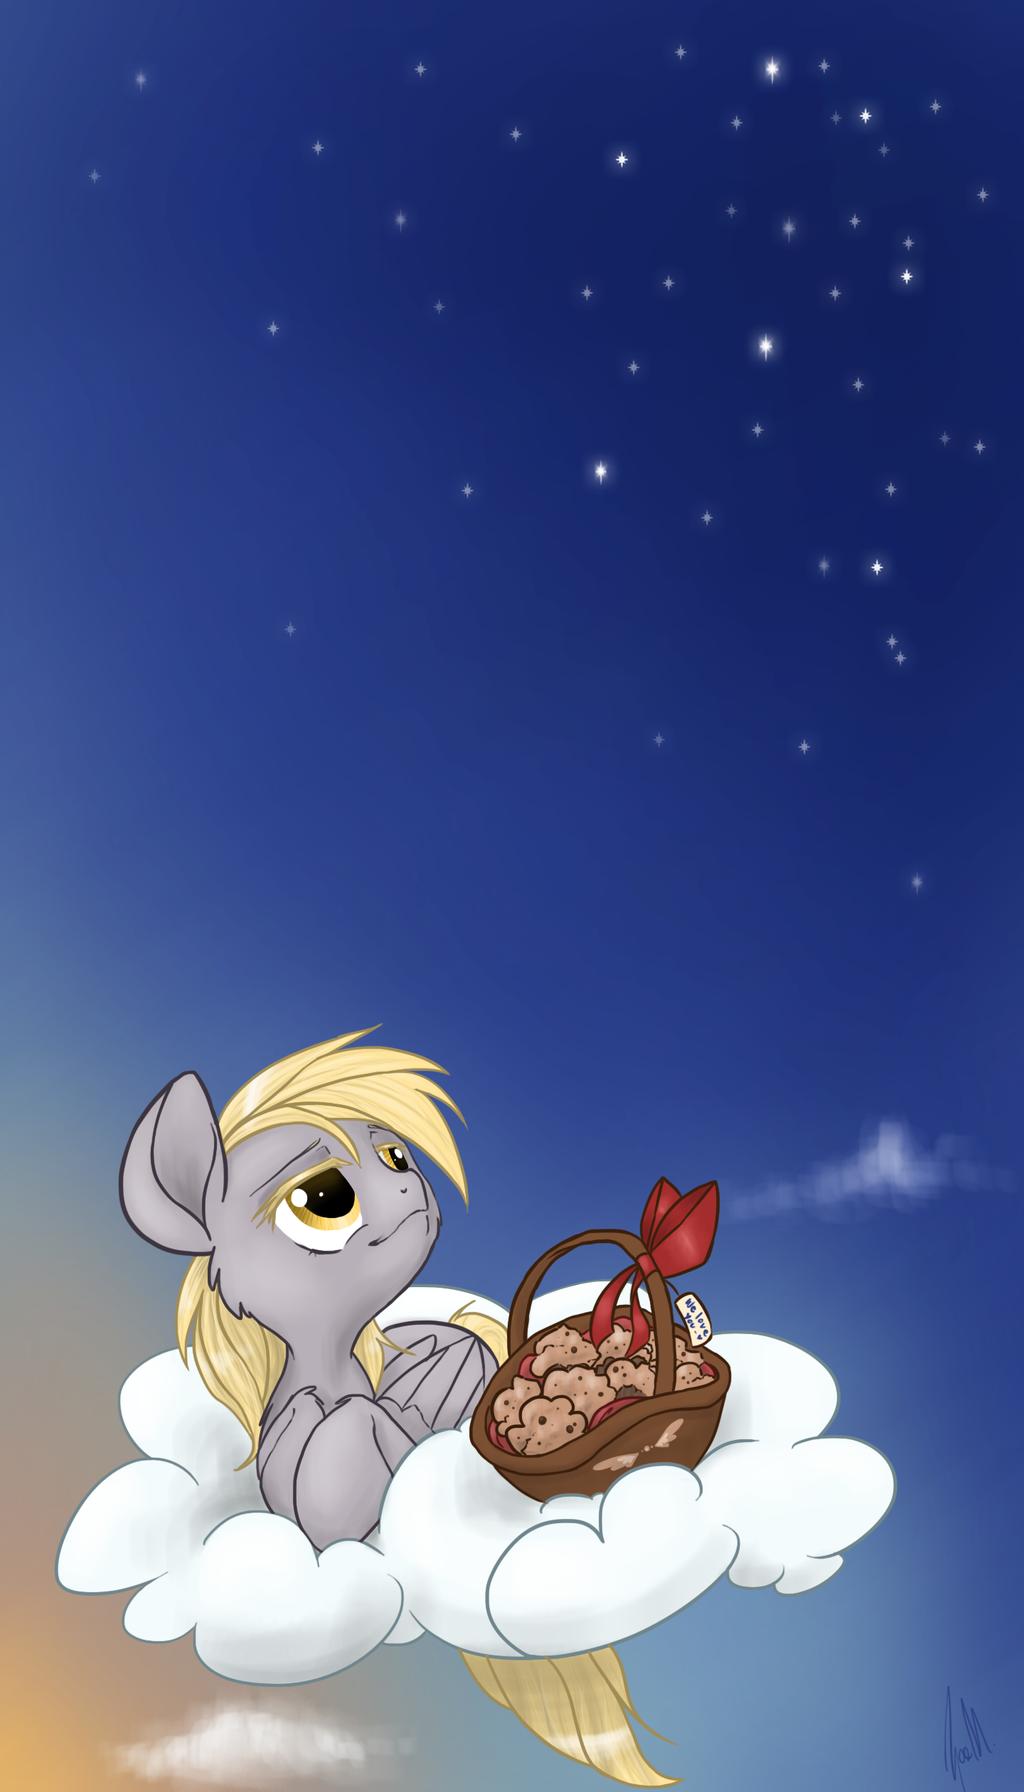 Enjoying Muffins by zoidledoidle